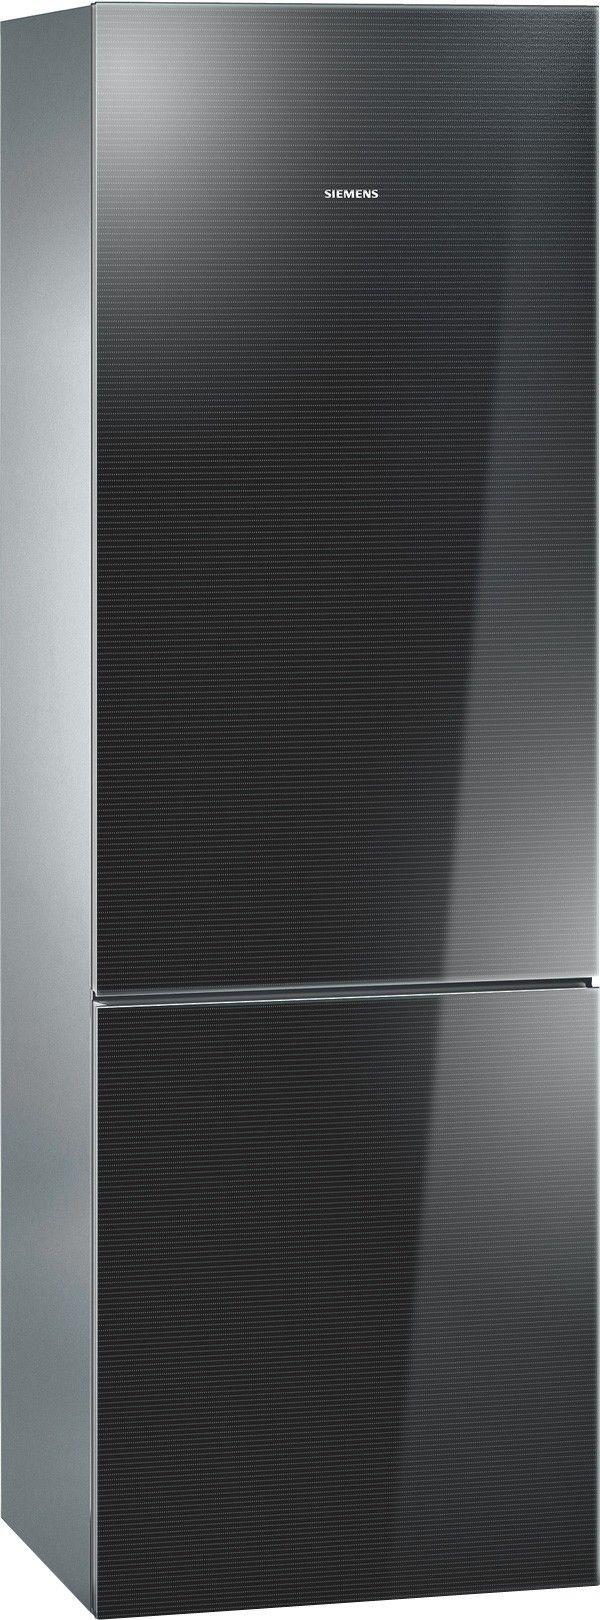 See Through Icebox Siemens Coolglass Fridge 1